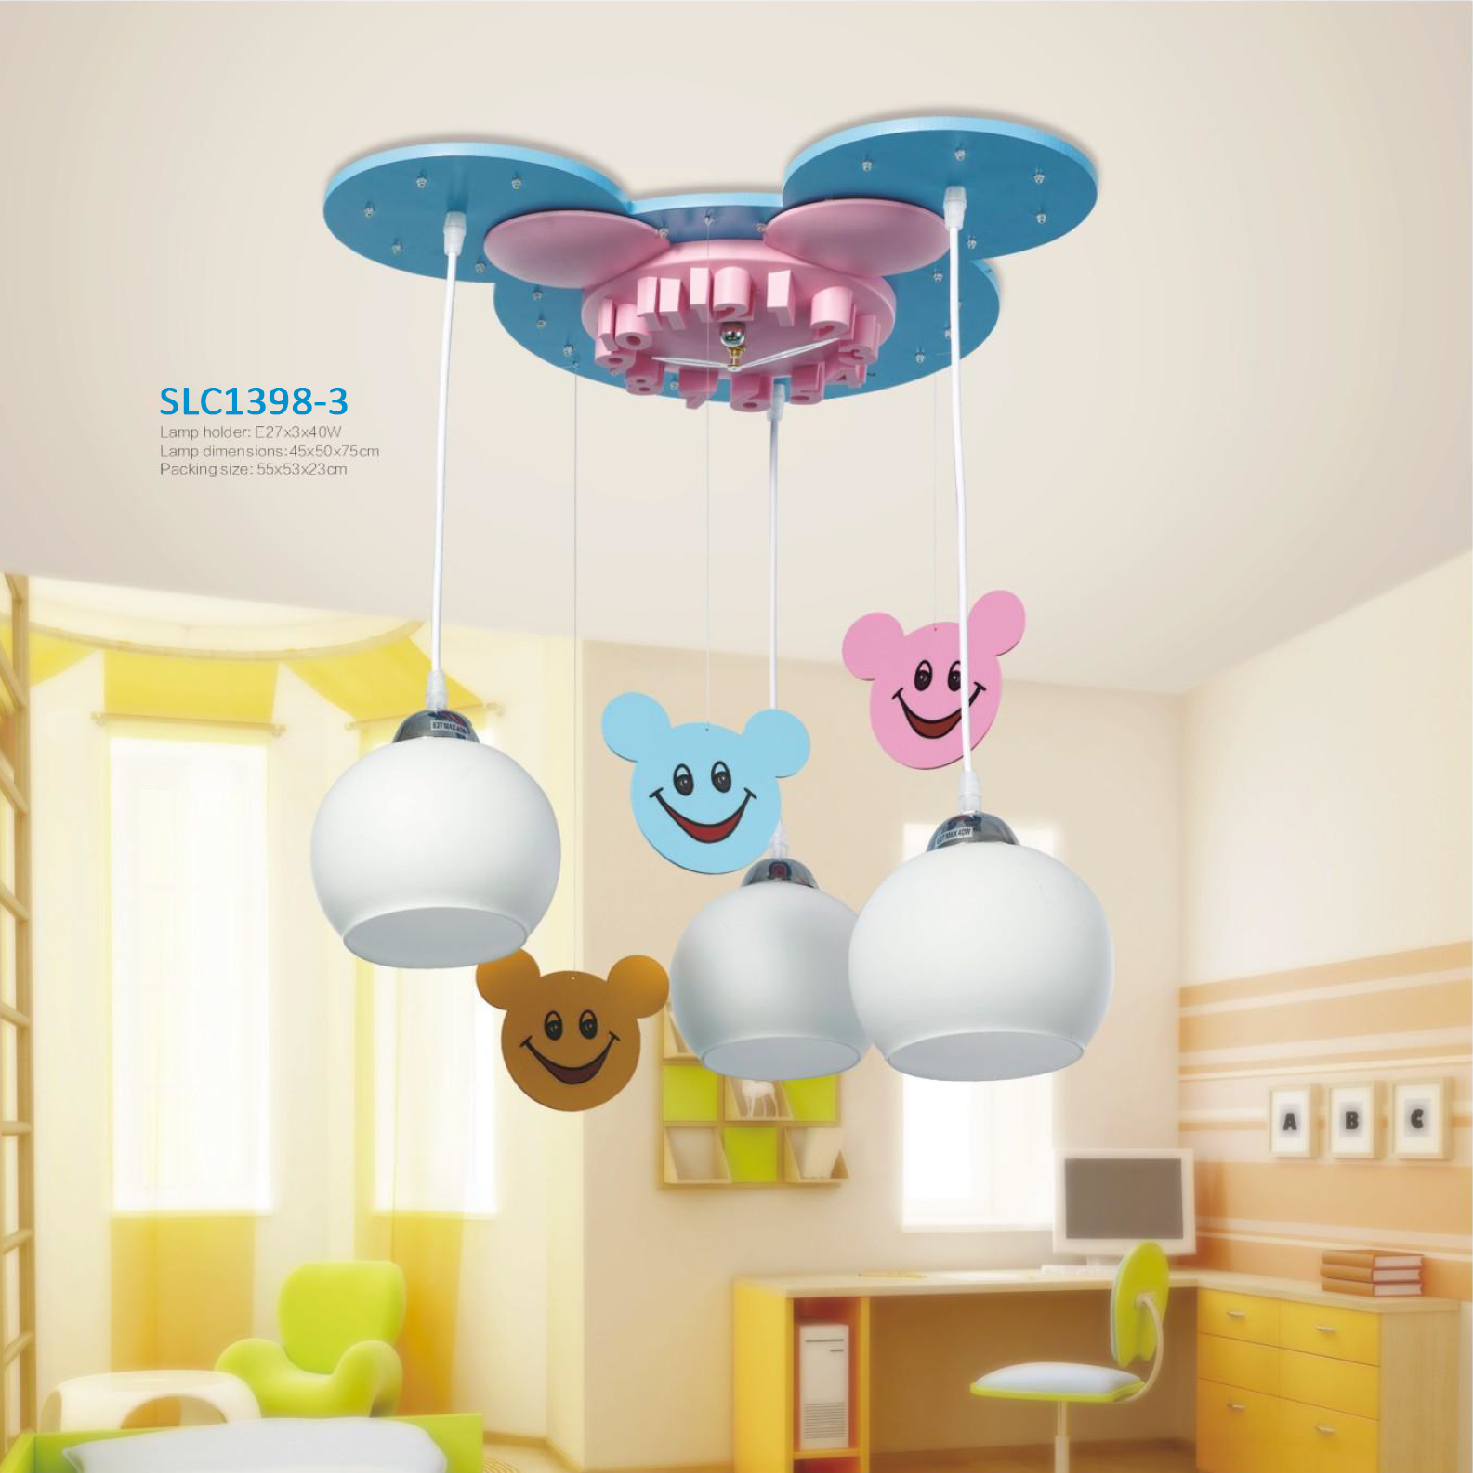 لوستر اتاق کودک (کد: slc1398-3) |